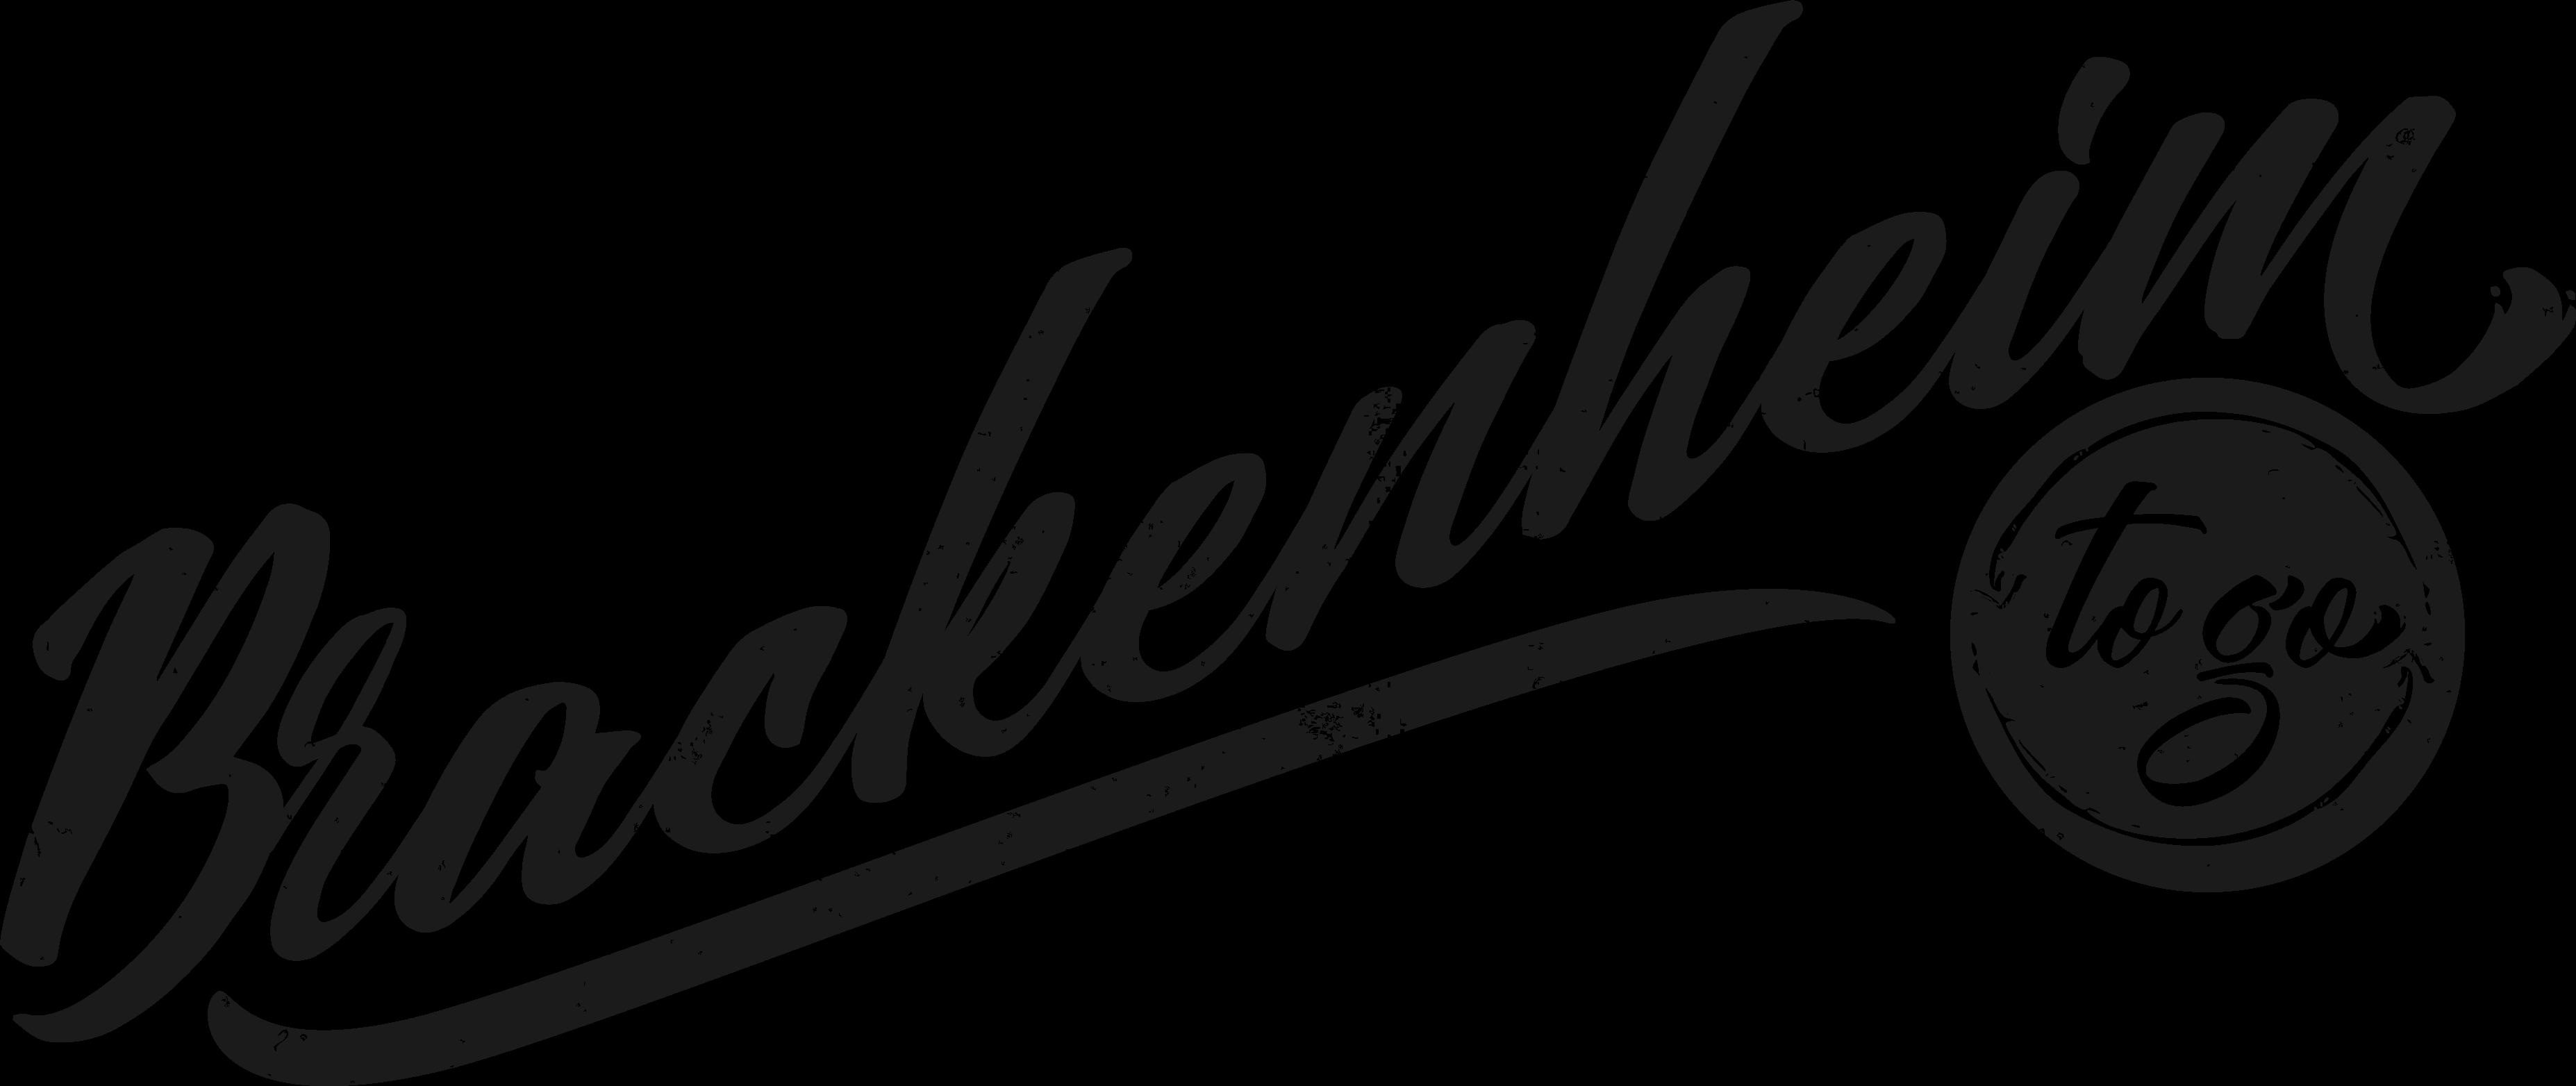 Logo Brackenheim to go